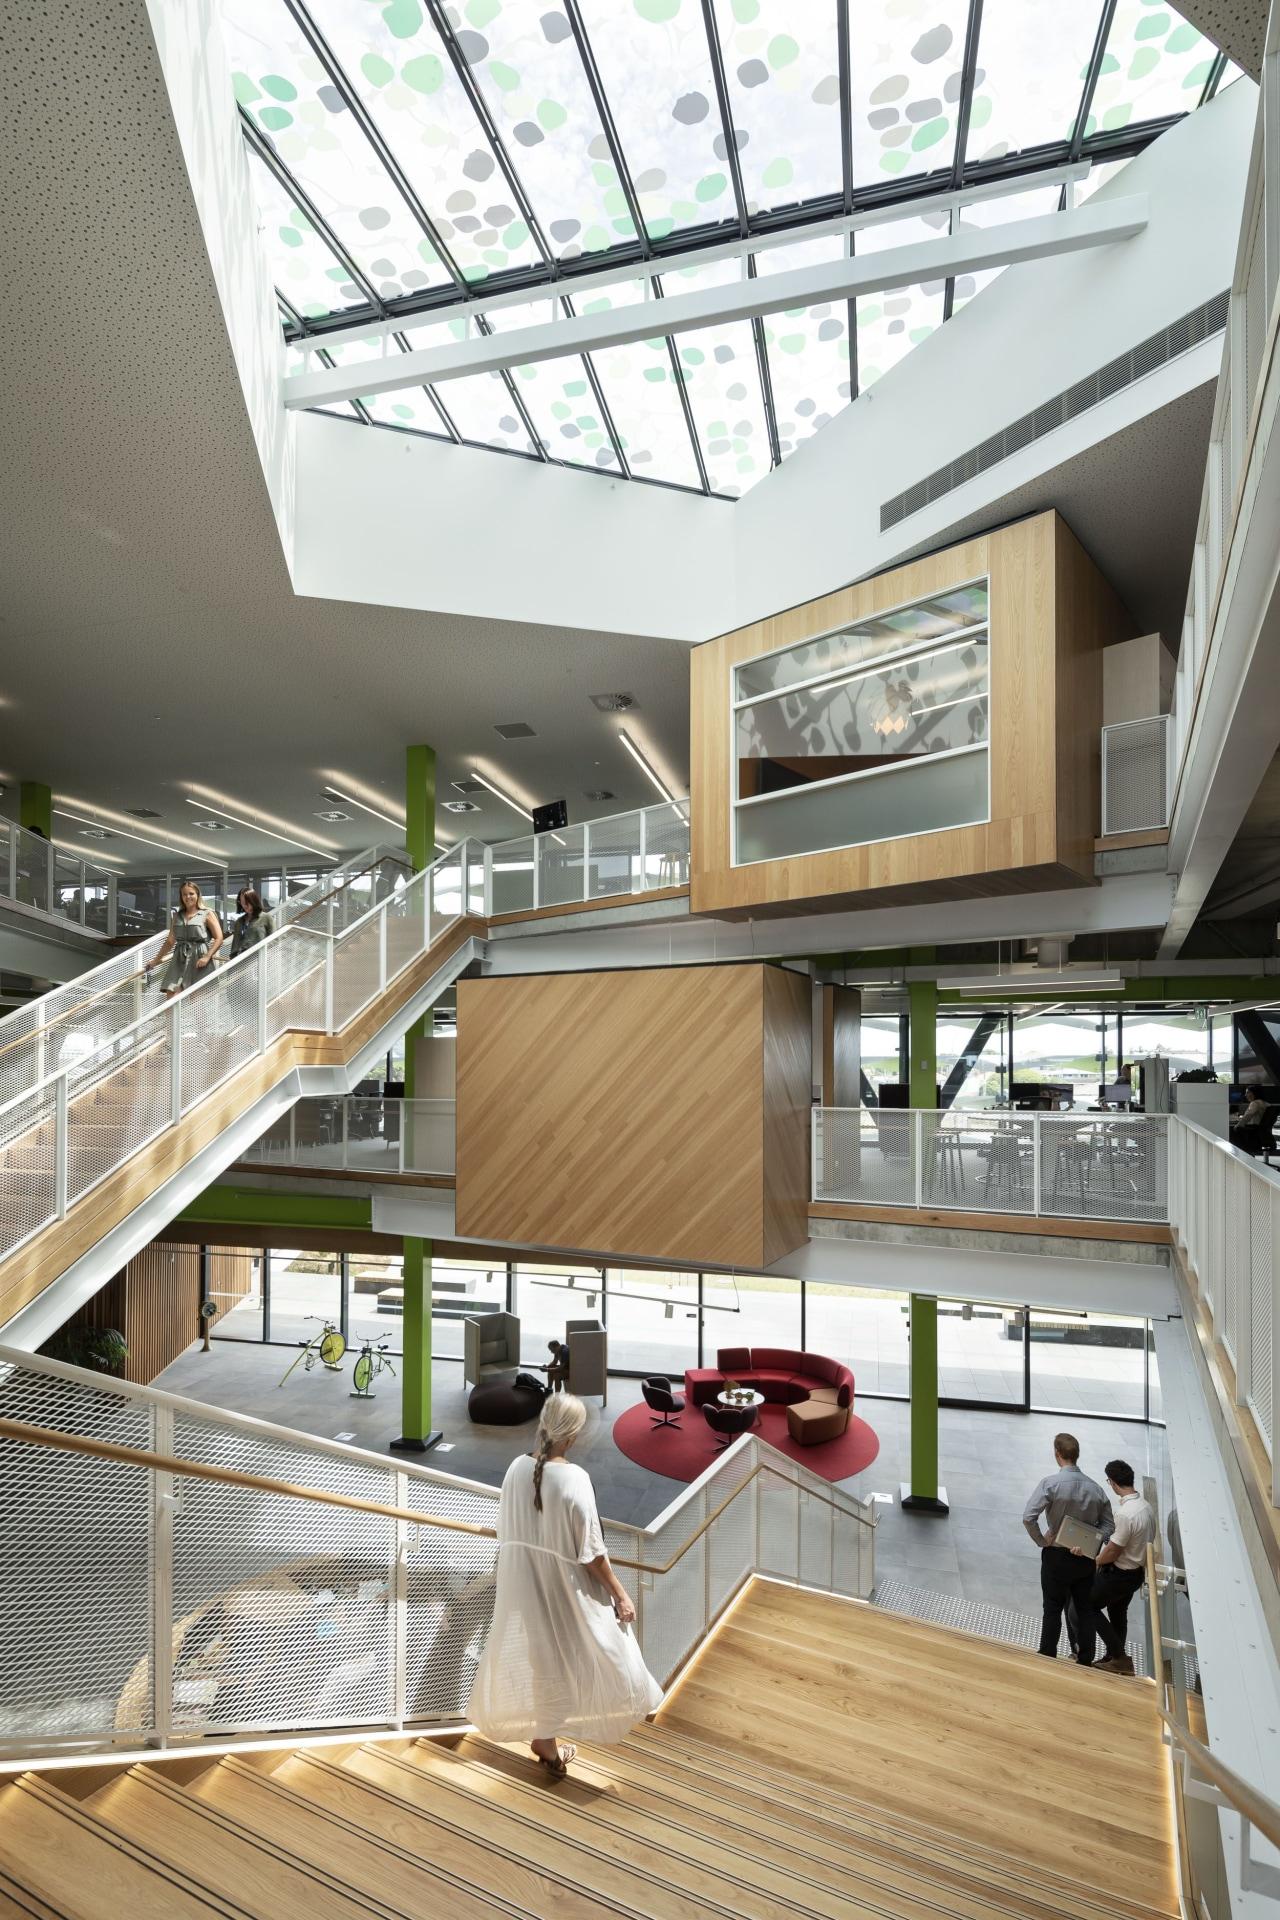 Open, light-filled and, well, fun, the Zespri building